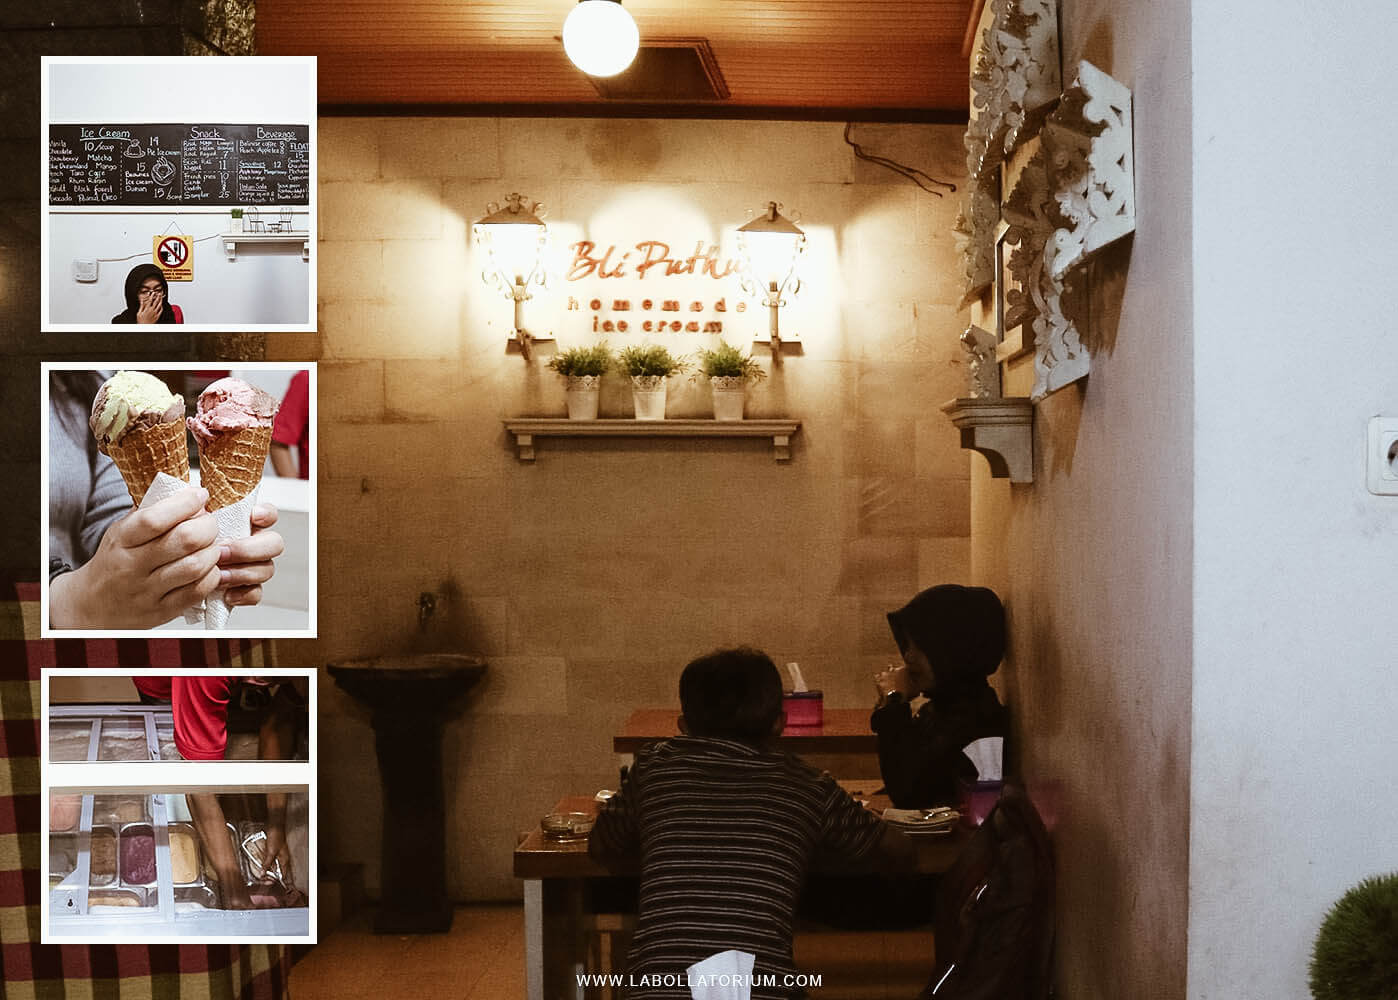 Bli Puthu Gelato Kediri - 7 Tempat Recommended Saat Explore Kediri Circa 2017